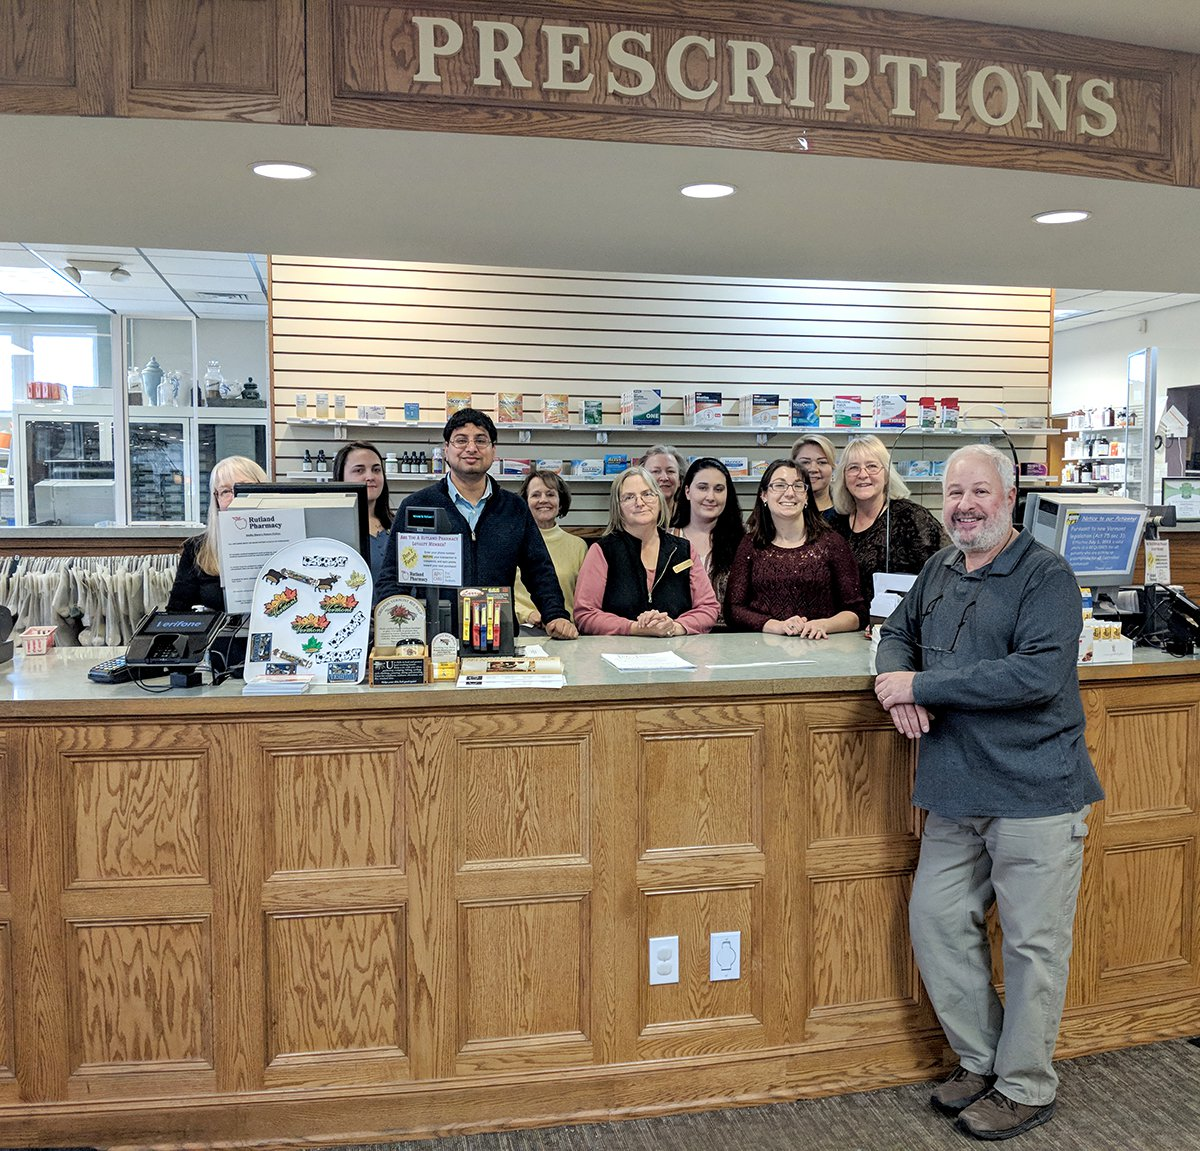 Smilin Steve Hochberg with Pharmacy Staff